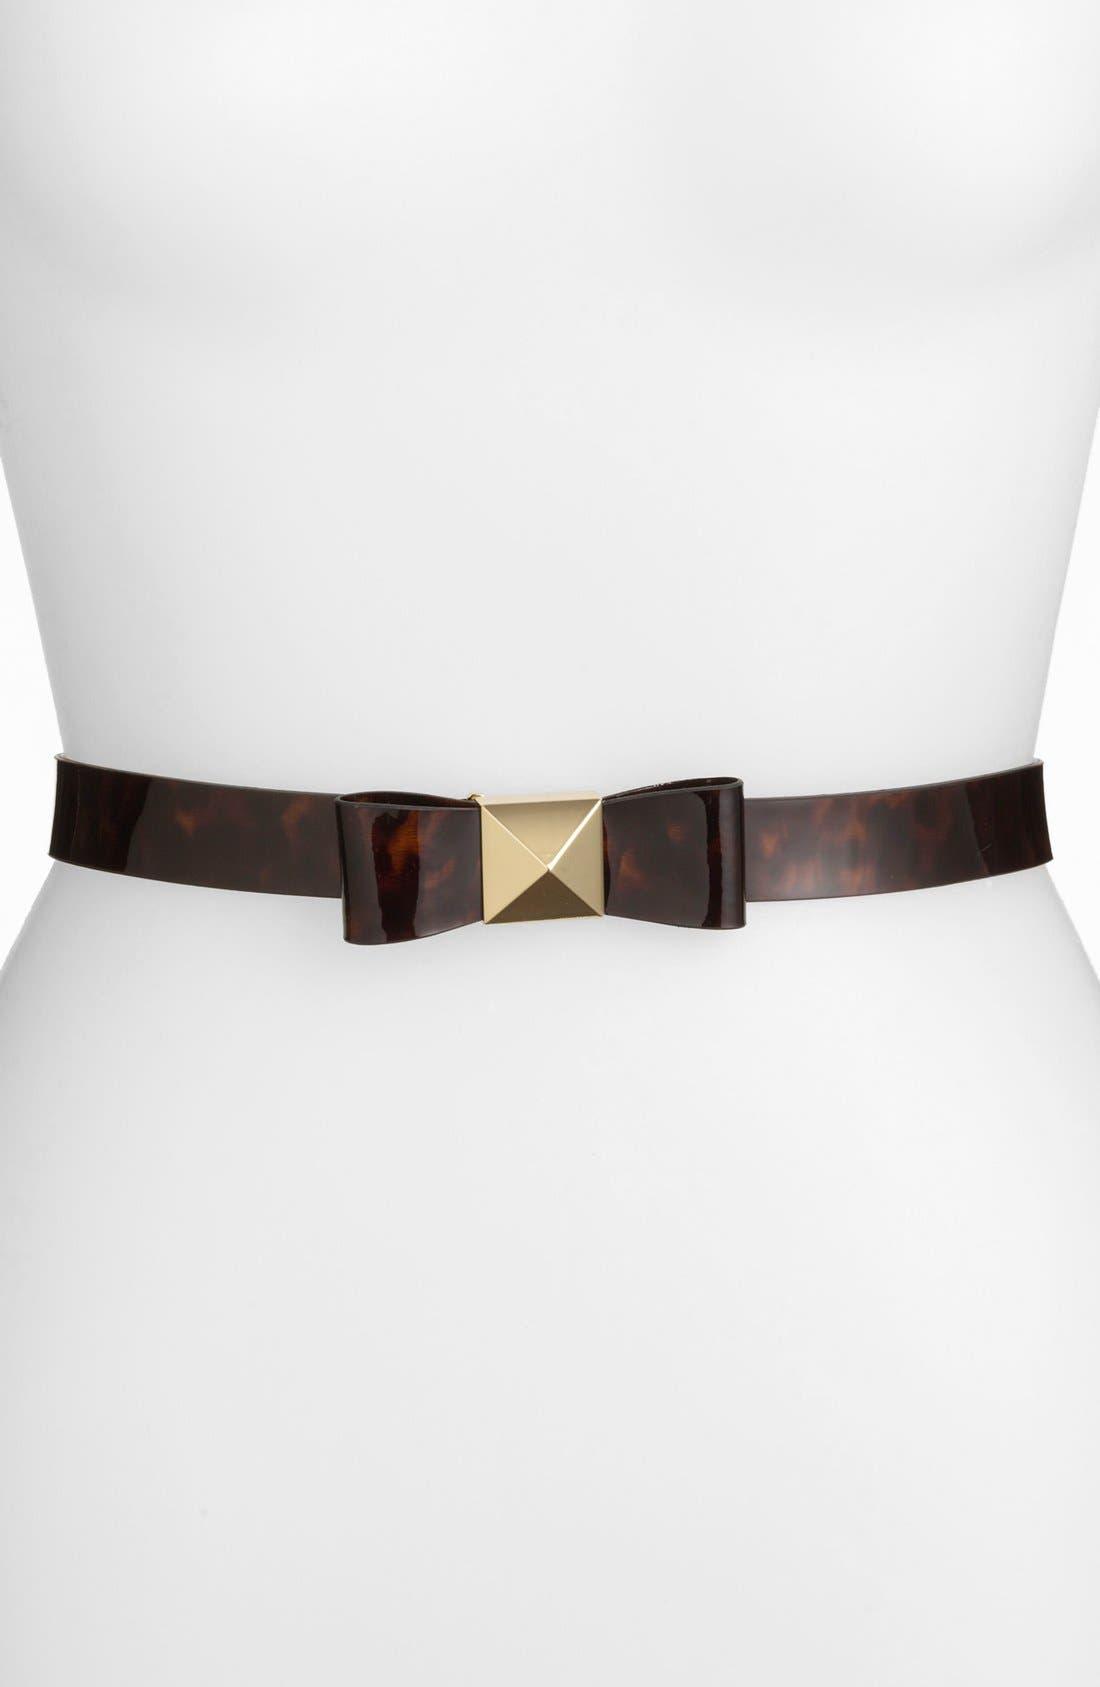 Main Image - kate spade new york 'pyramid bow' leather belt